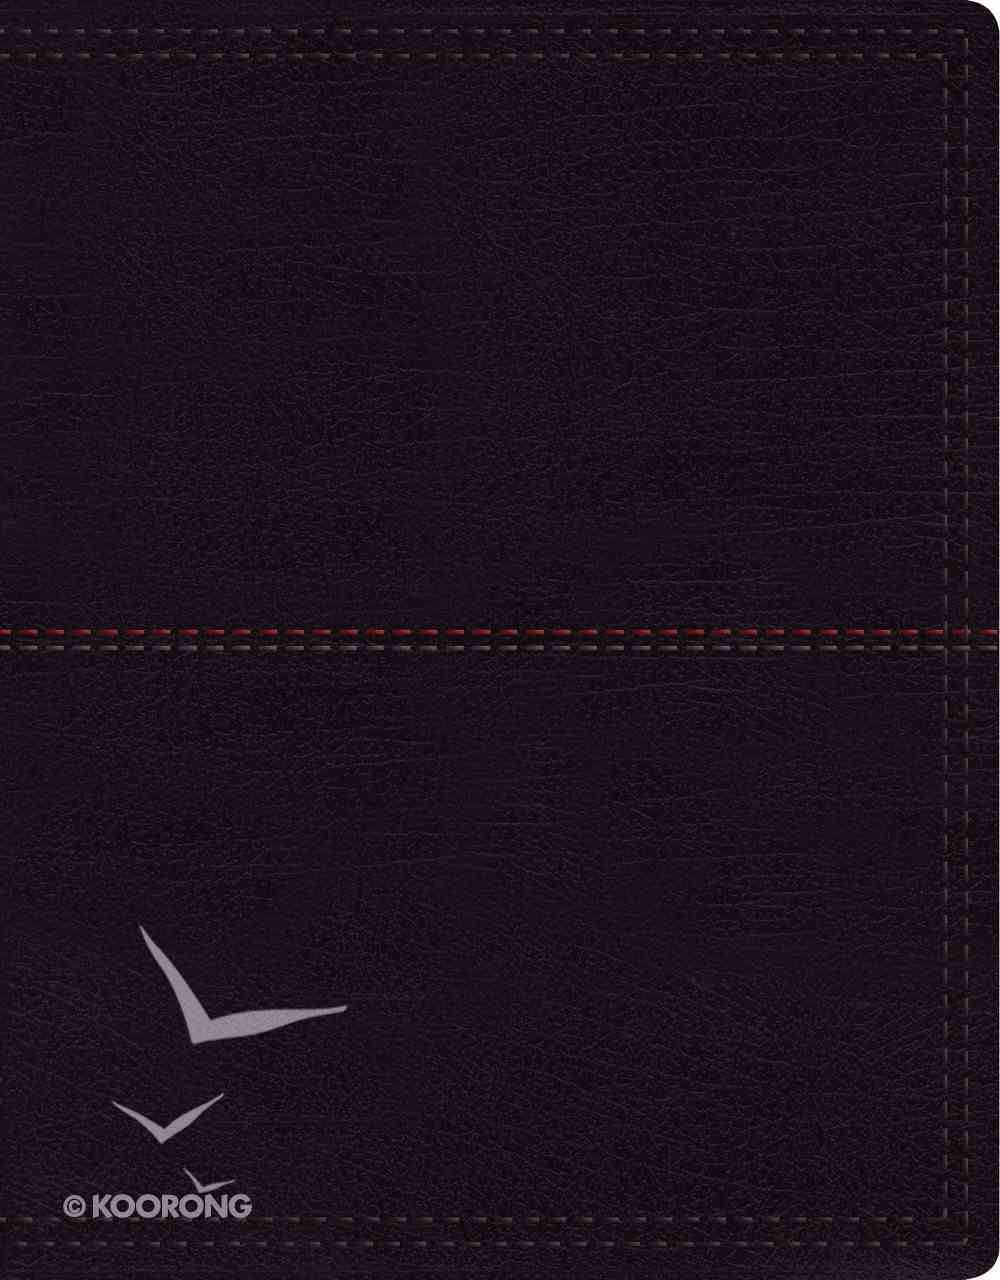 NIV Journal the Word Bible Large Print Black (Black Letter Edition) Premium Imitation Leather